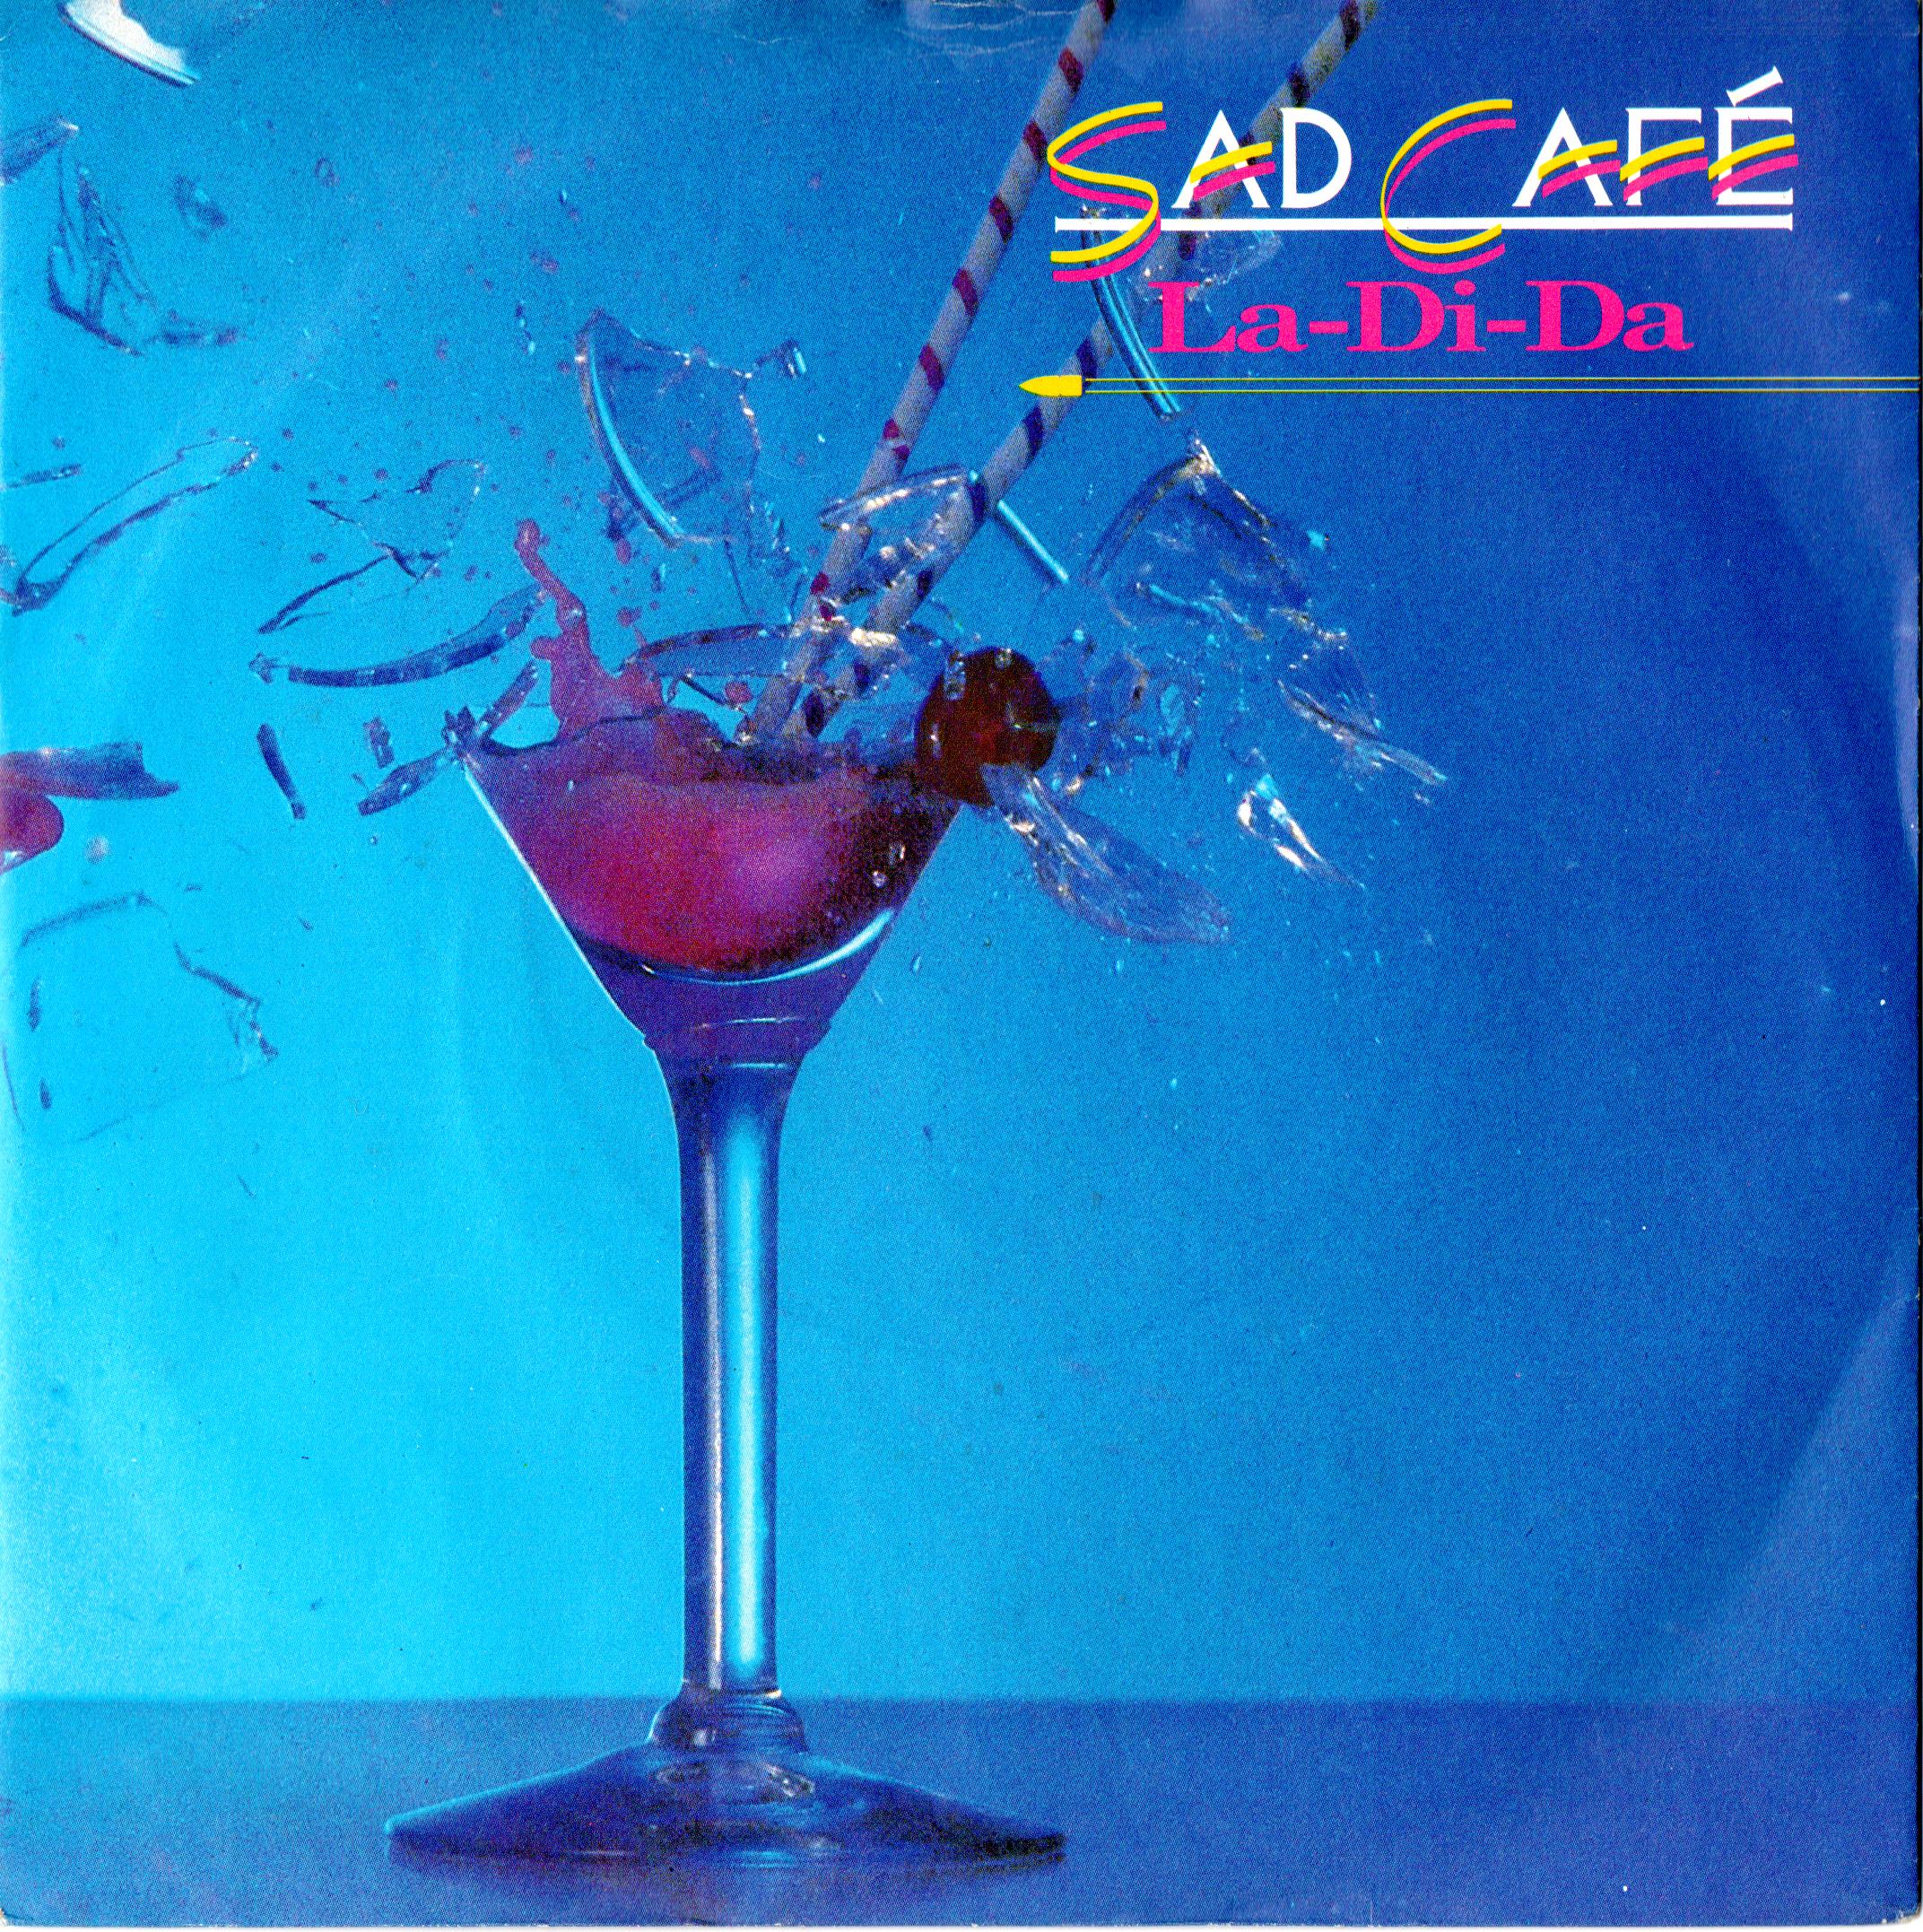 Sad Cafe 7